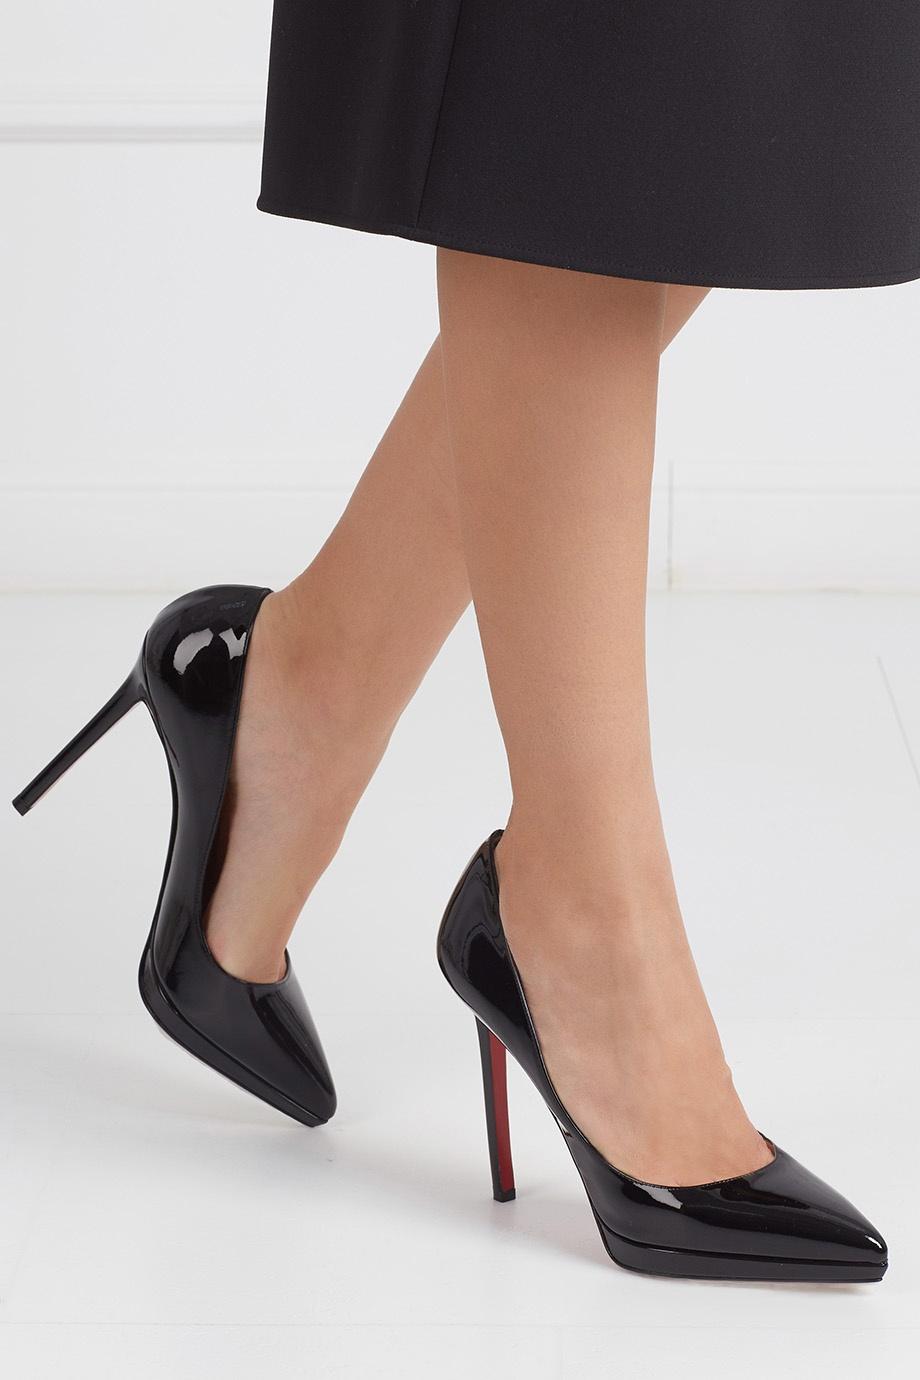 wholesale dealer be586 2a9c5 Туфли из лакированной кожи Pigalle Plato 120